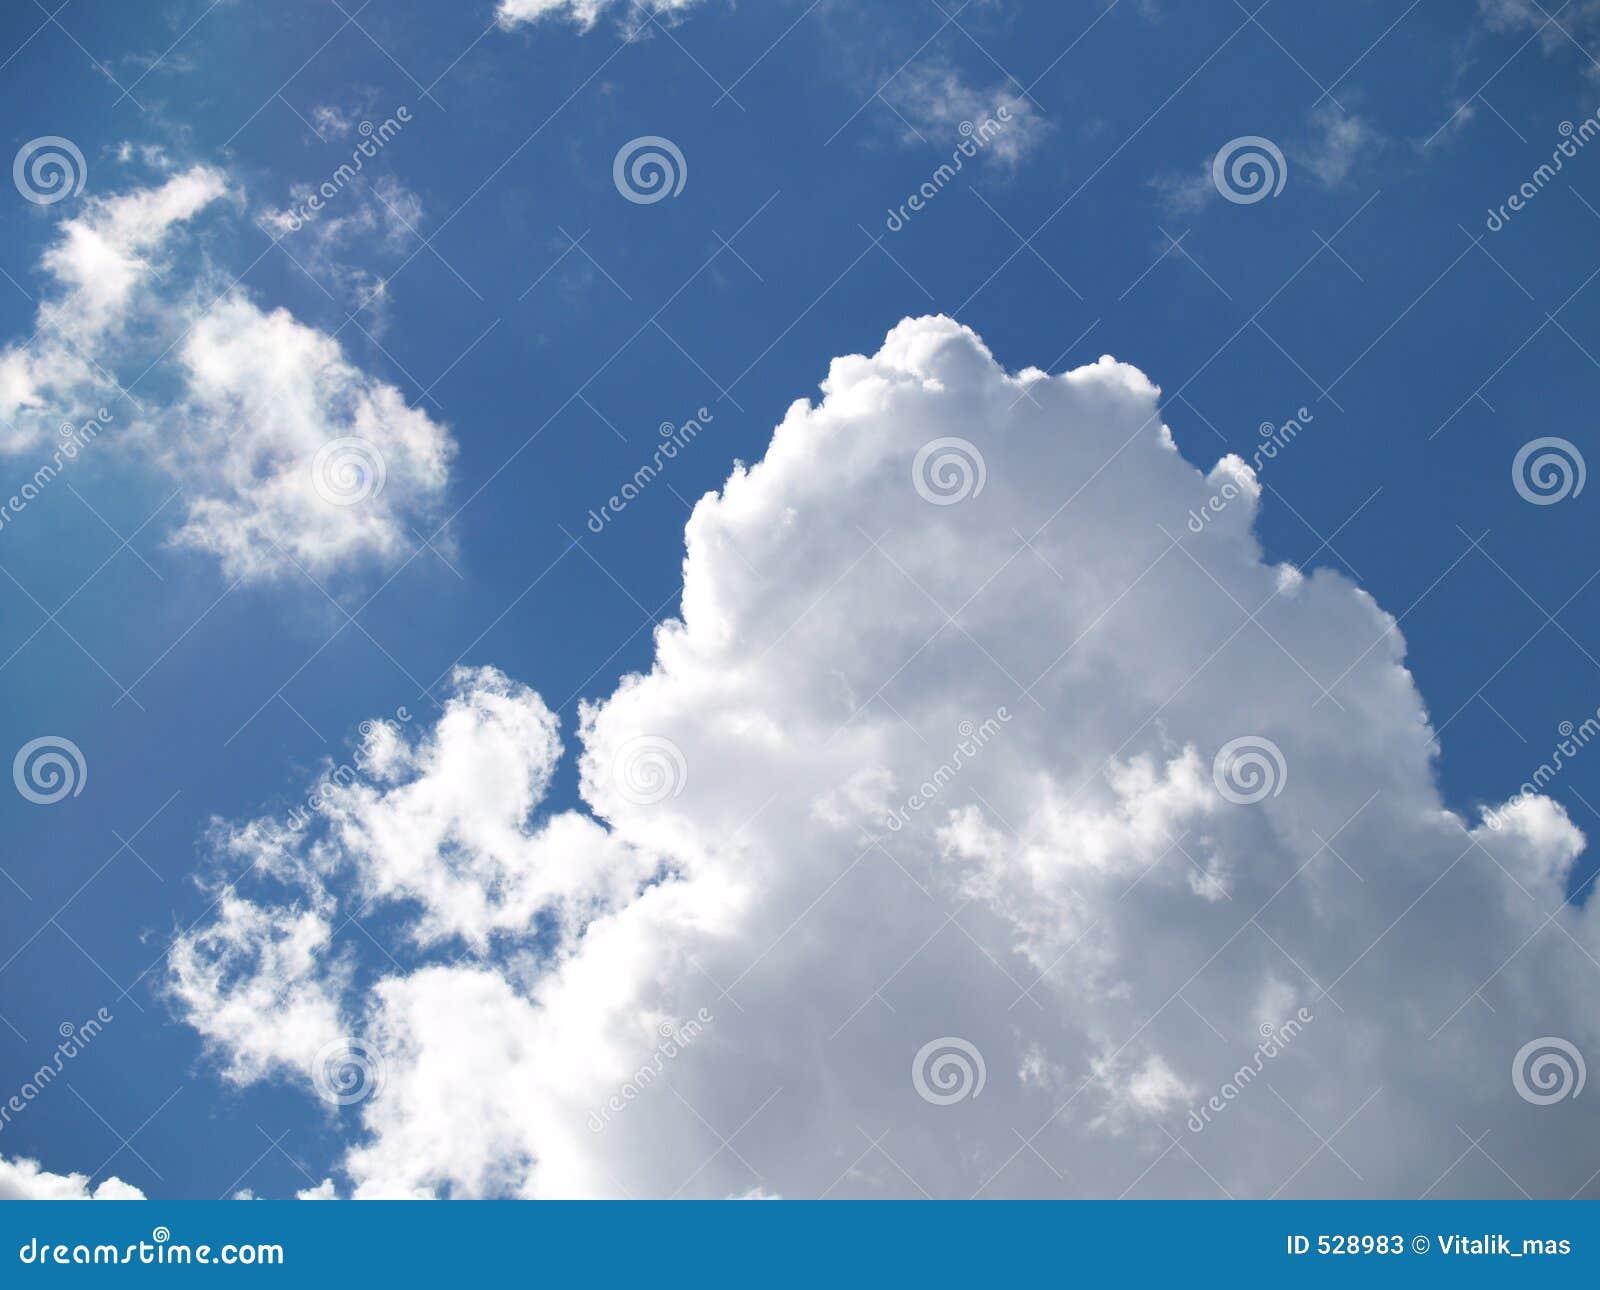 Download 云彩 库存图片. 图片 包括有 空白, 蓝色, 黑暗, 开放, 天空, 云彩, 早晨 - 528983